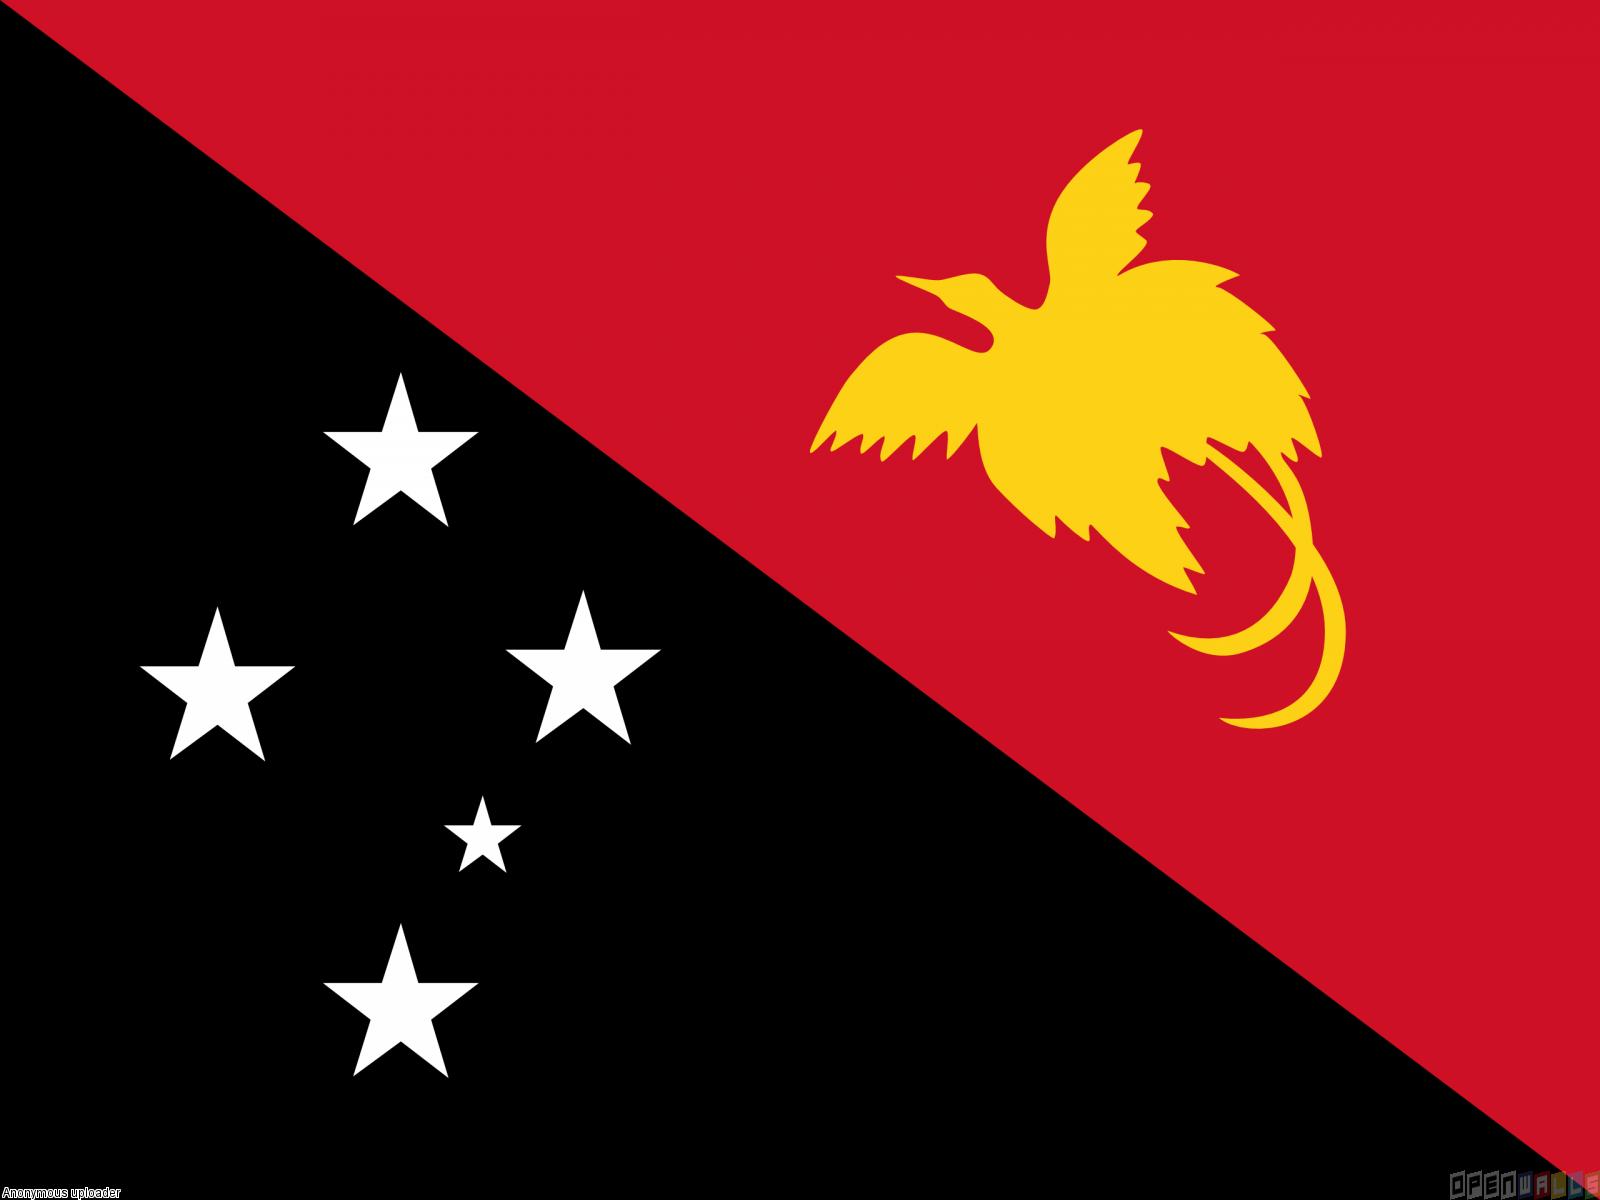 Papua new guinea flag papua new guinea flag wallpaper 20176 explore yellow birds national flag and more sciox Choice Image